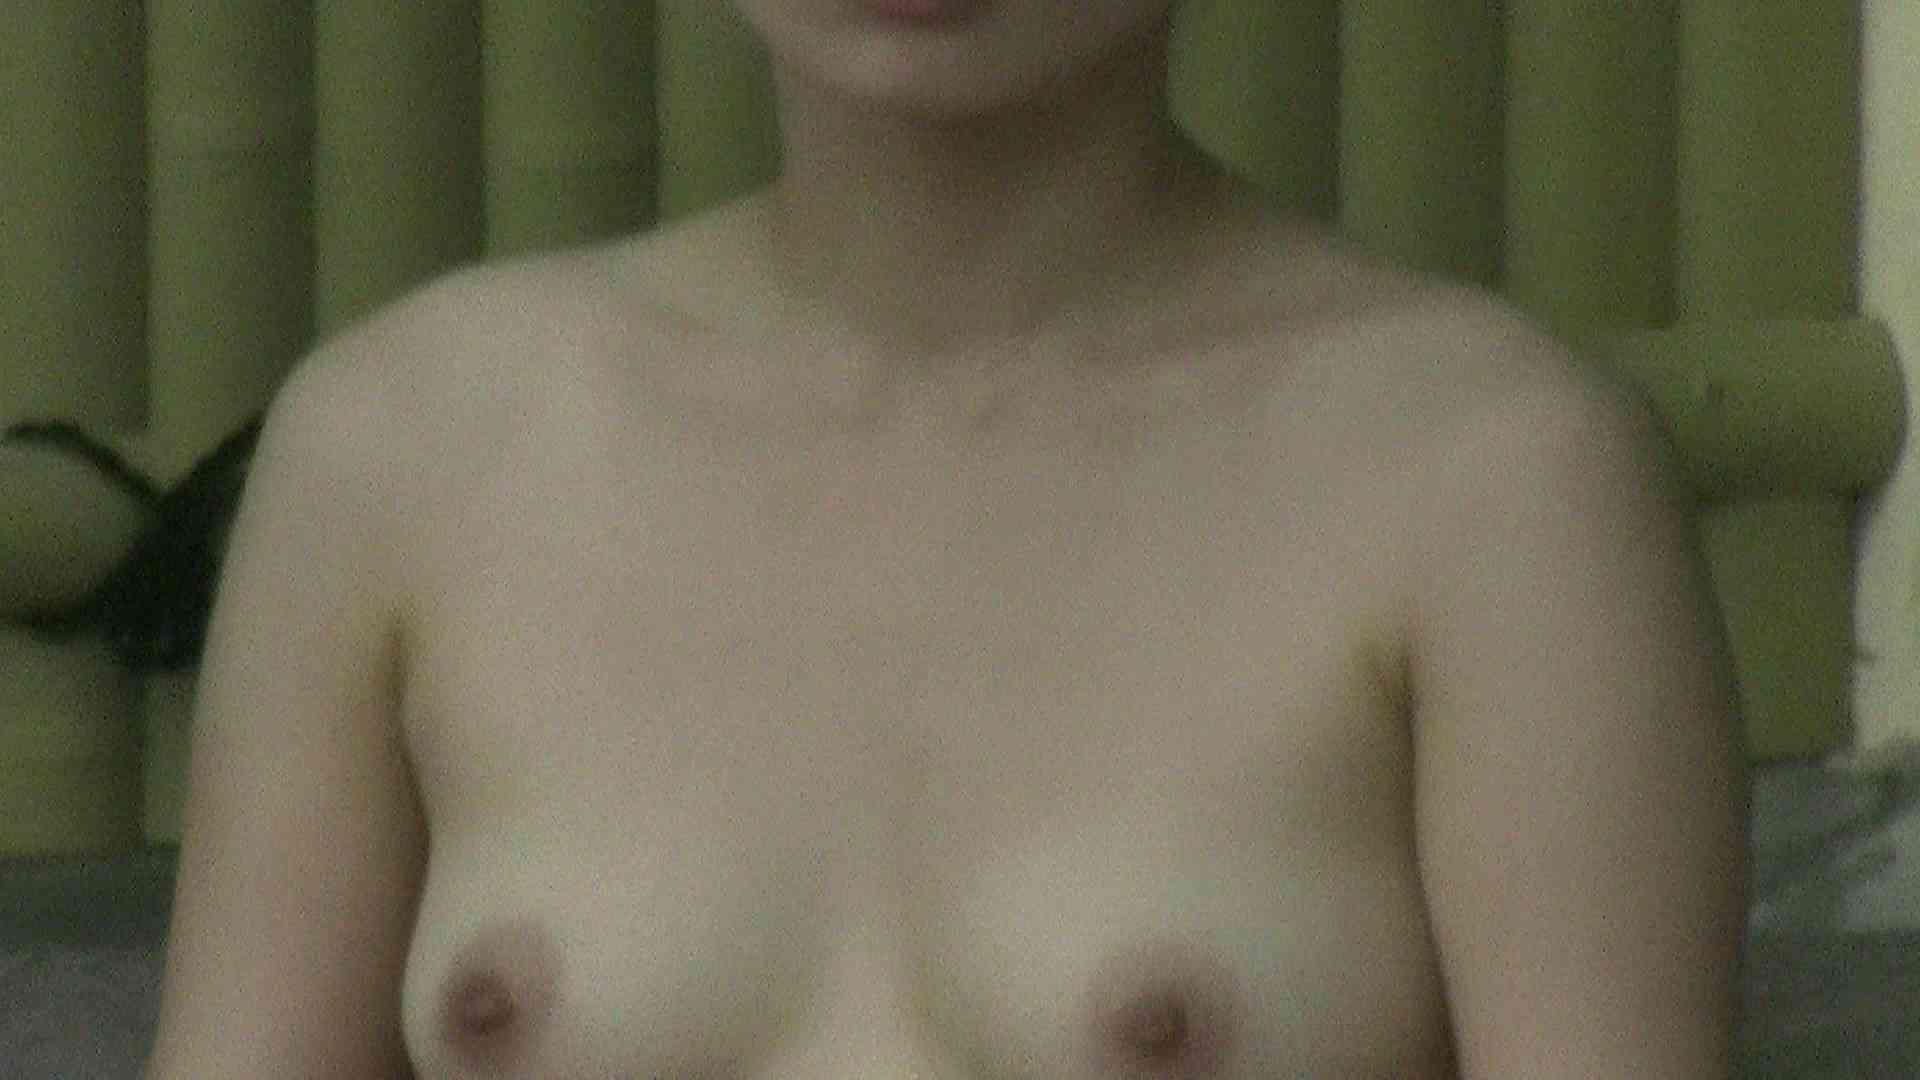 Aquaな露天風呂Vol.208 OLセックス  85画像 69